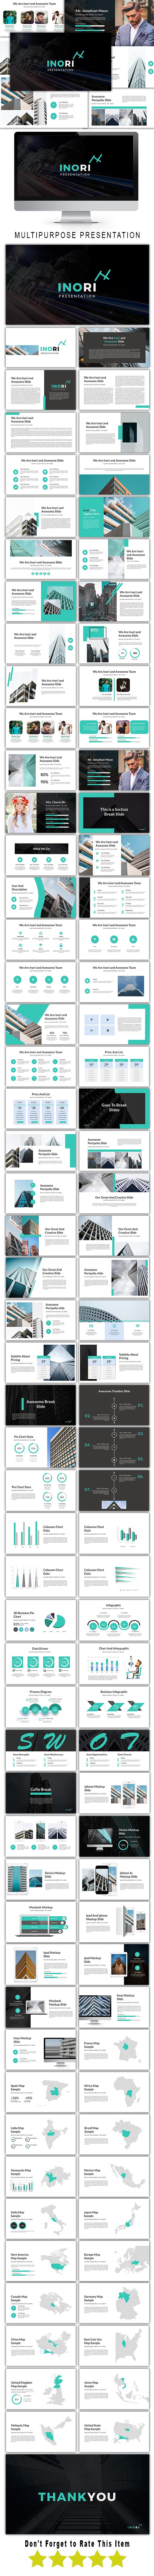 Inori Multipurpose Google Slide Template - Google Slides Presentation Templates